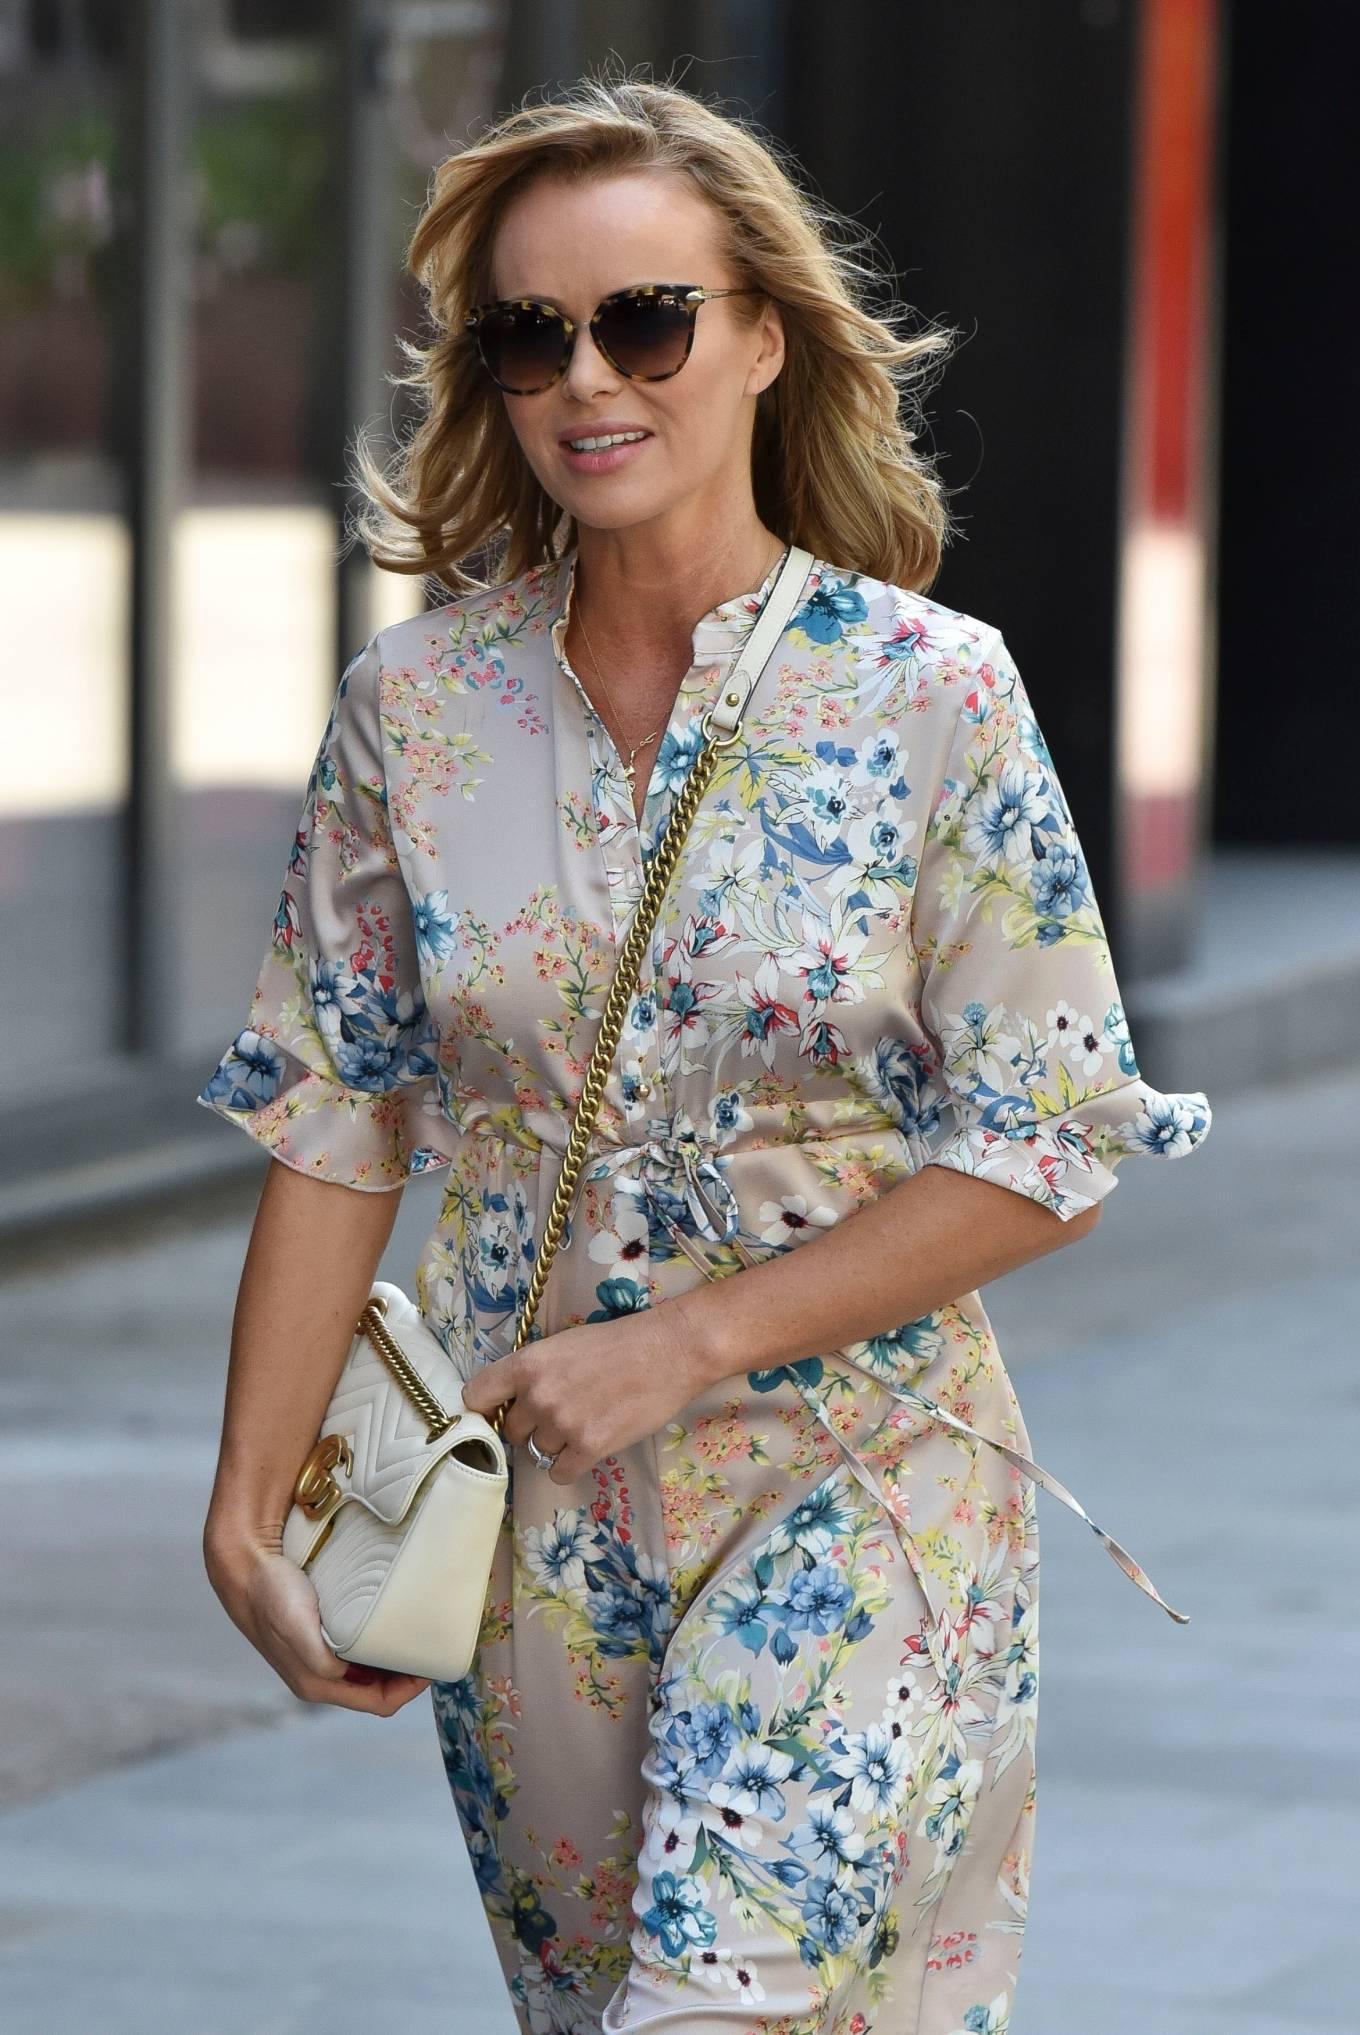 Amanda Holden 2020 : Amanda Holden – Spotted in floral jumpsuit at Global Radio Studios-05